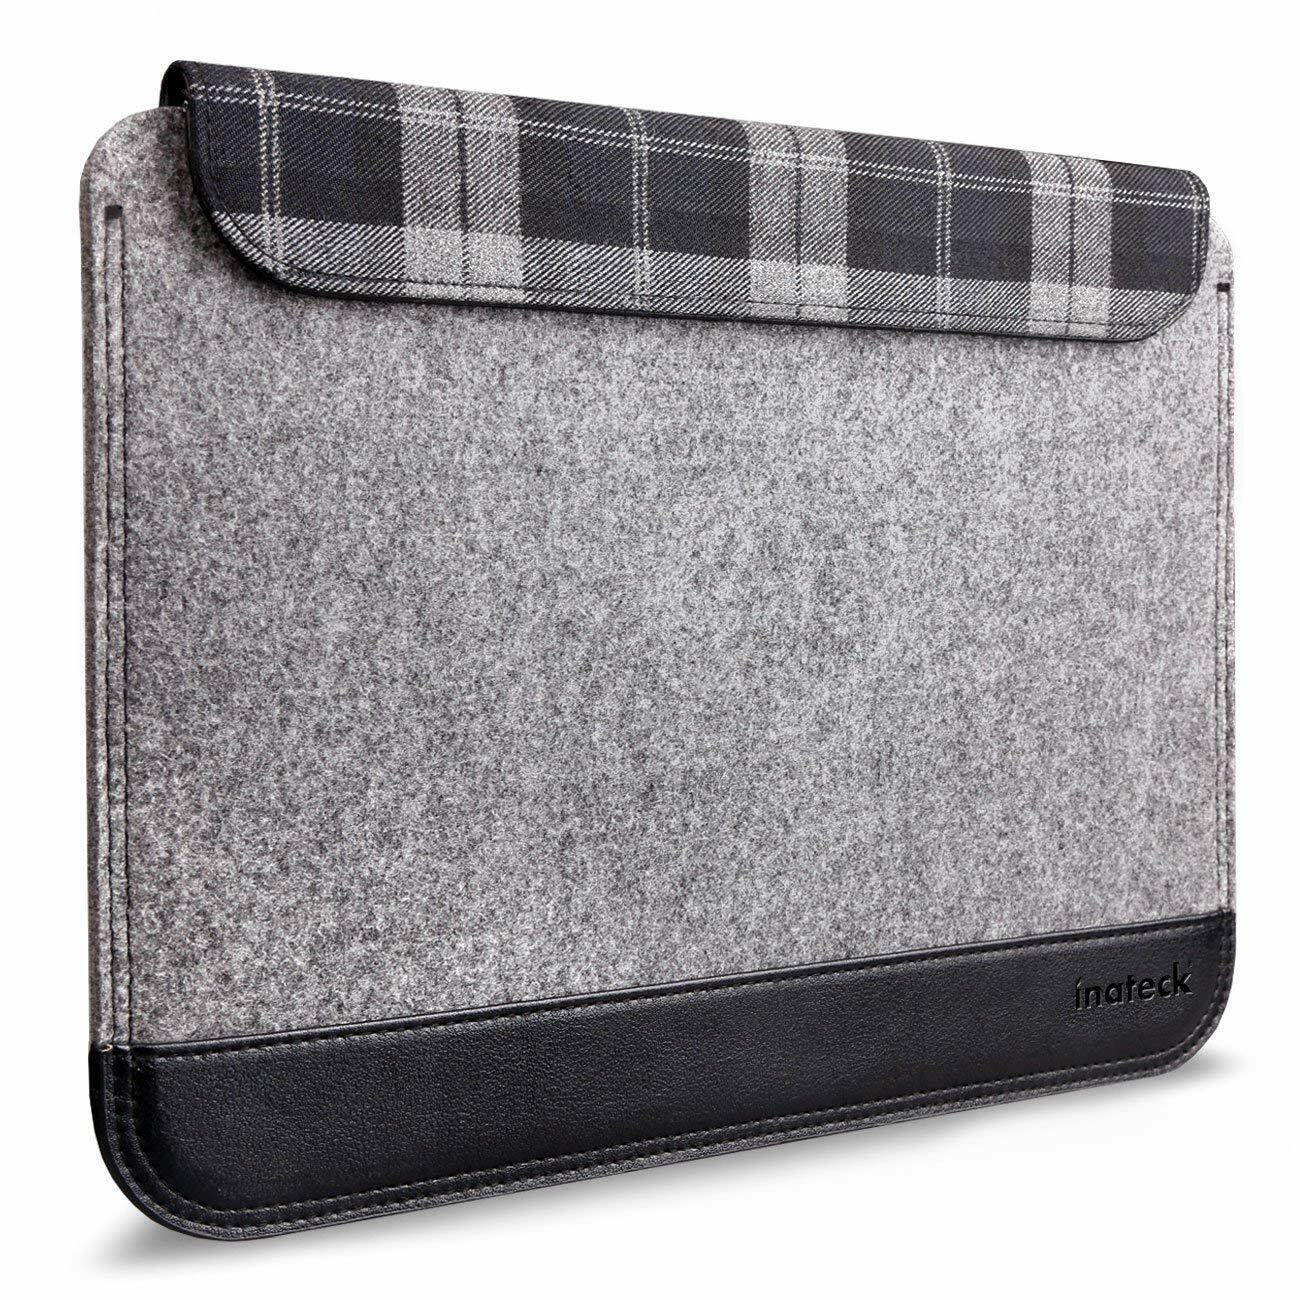 Inateck 11 Zoll Filz Laptop Hülle Ultraschlanke Notebook Tasche Tablet-Tasche